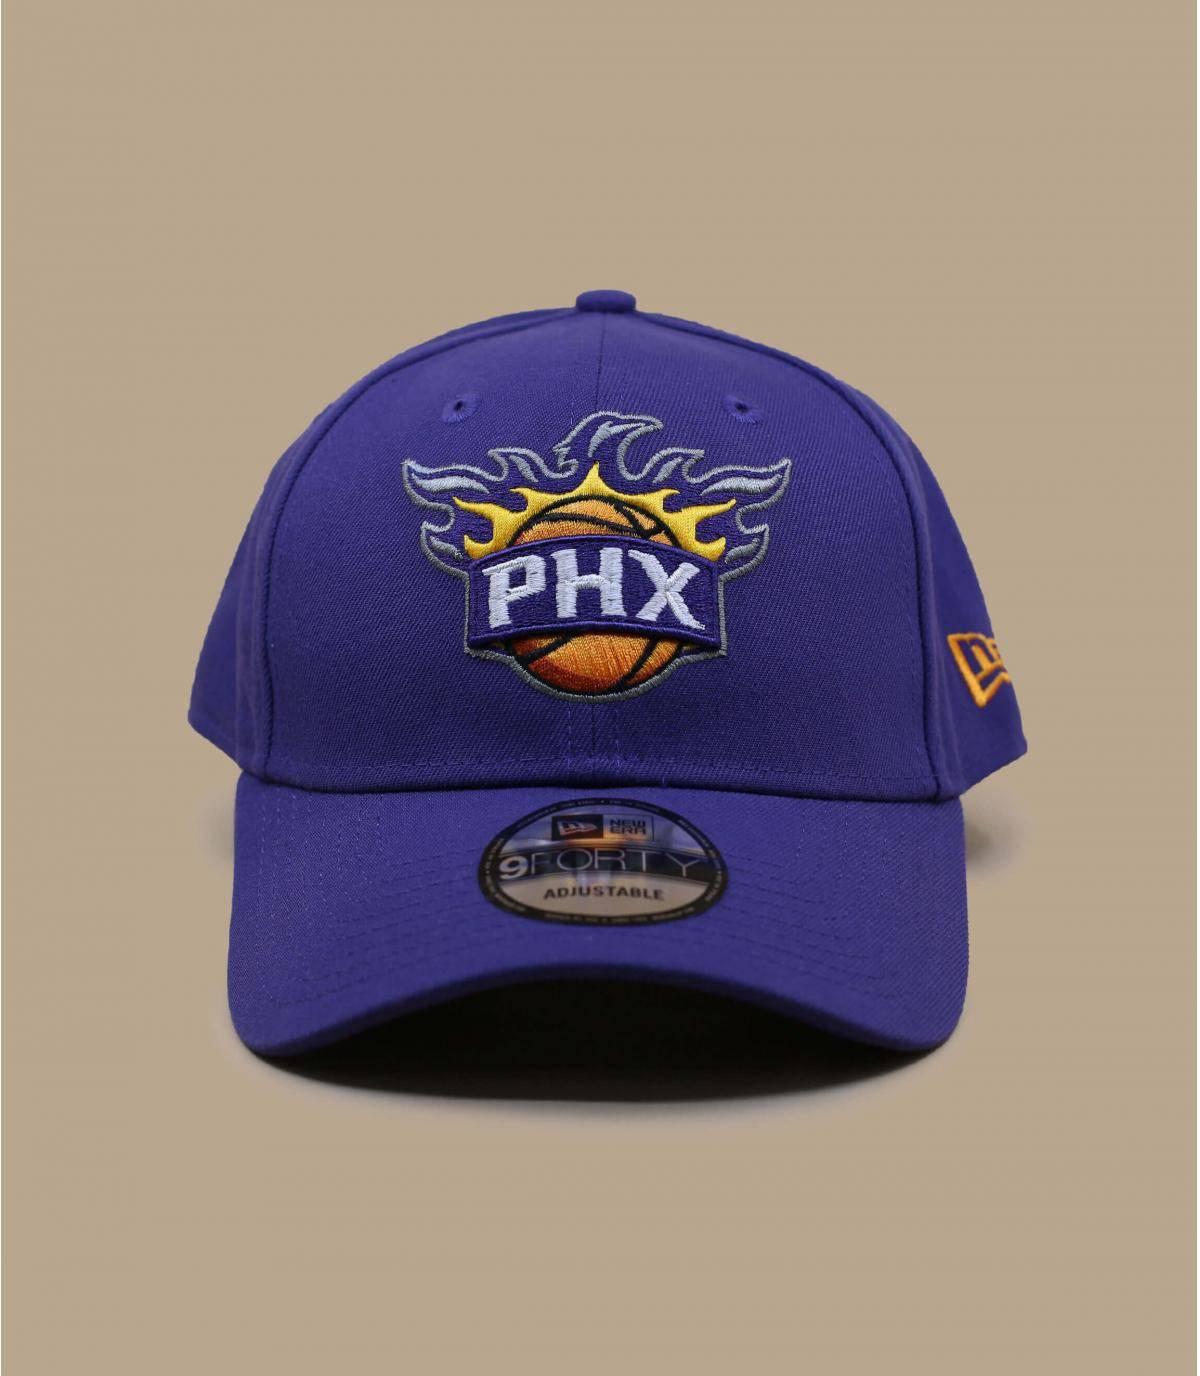 Phoenix Suns cap